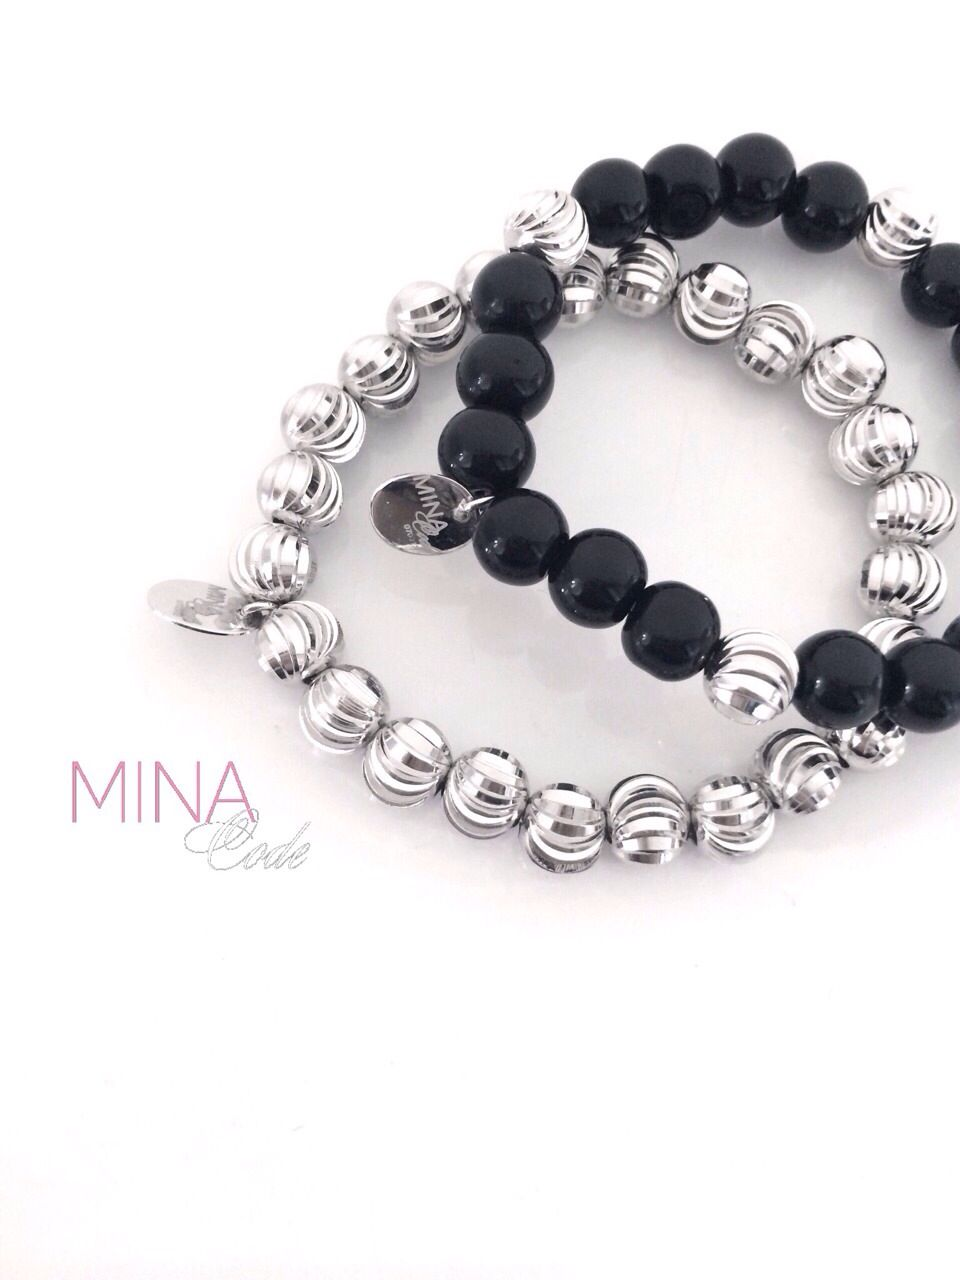 Onyx and White Gold bracelet by Mina Code